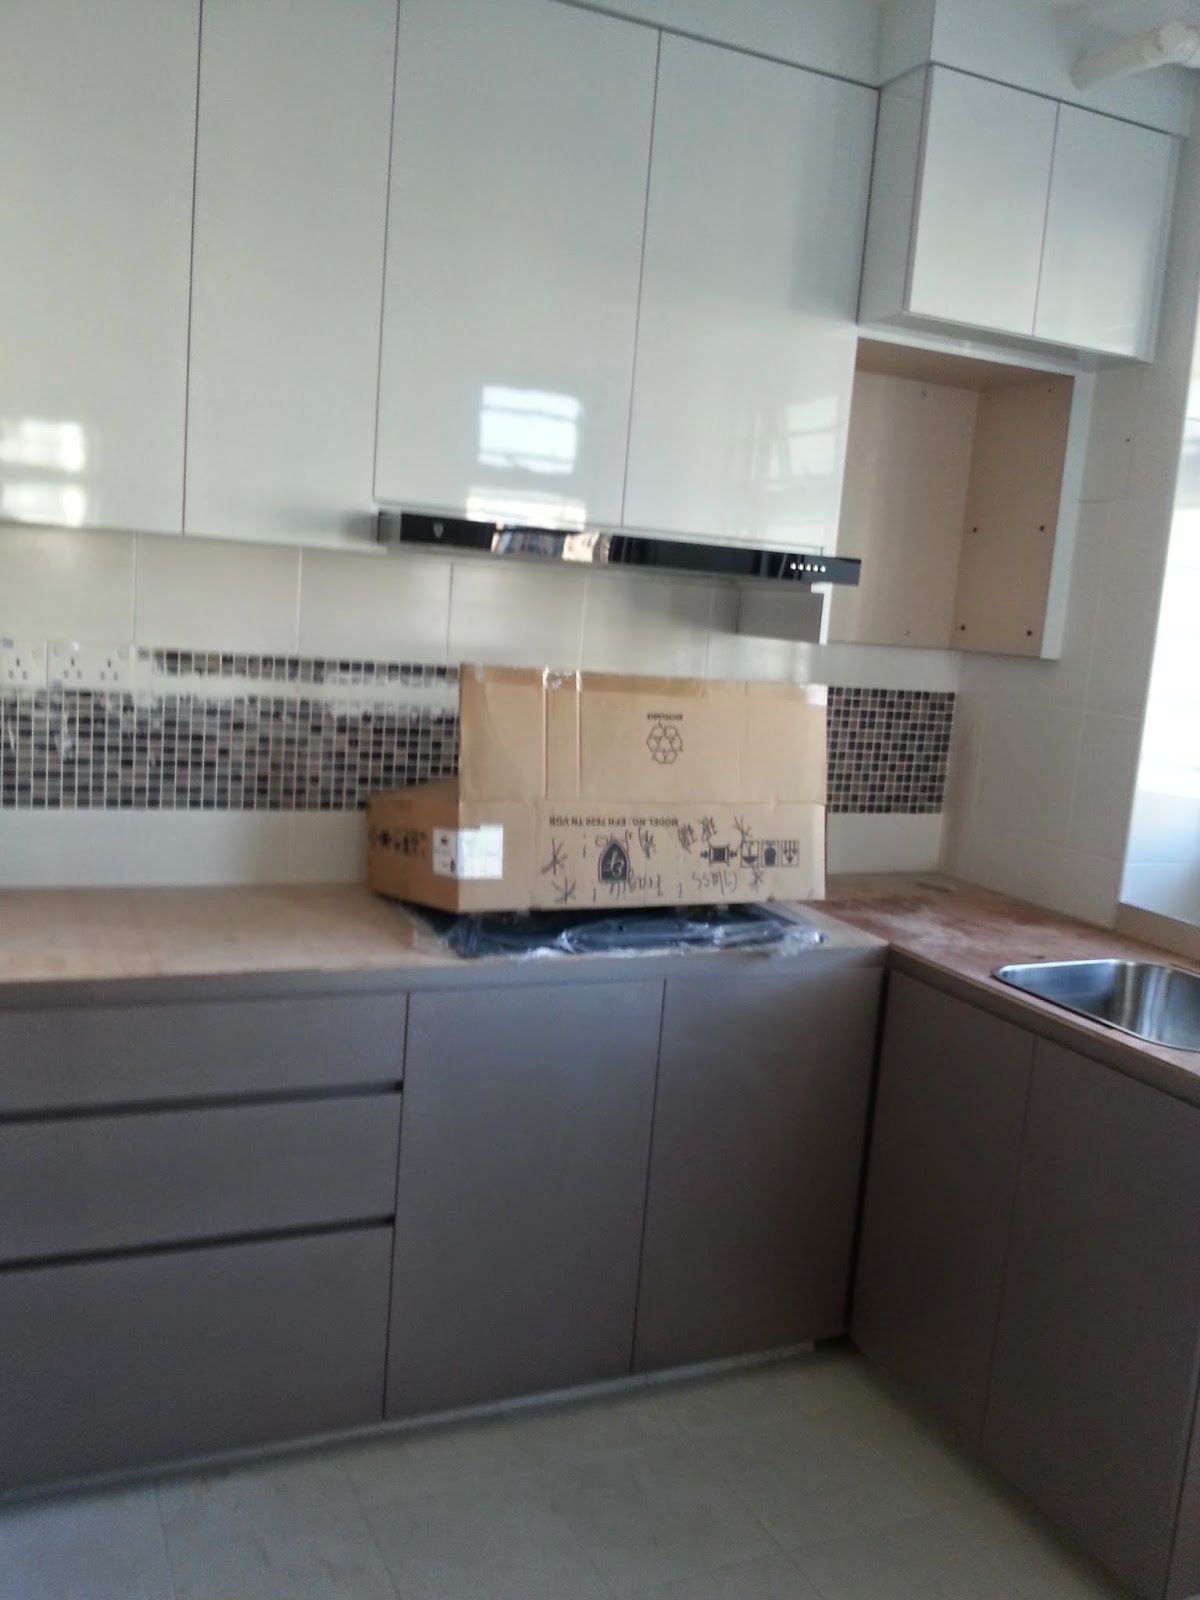 Small Black Kitchen Table Sofa Hdb 2 Room Bto Renovation Space ,big Ideas